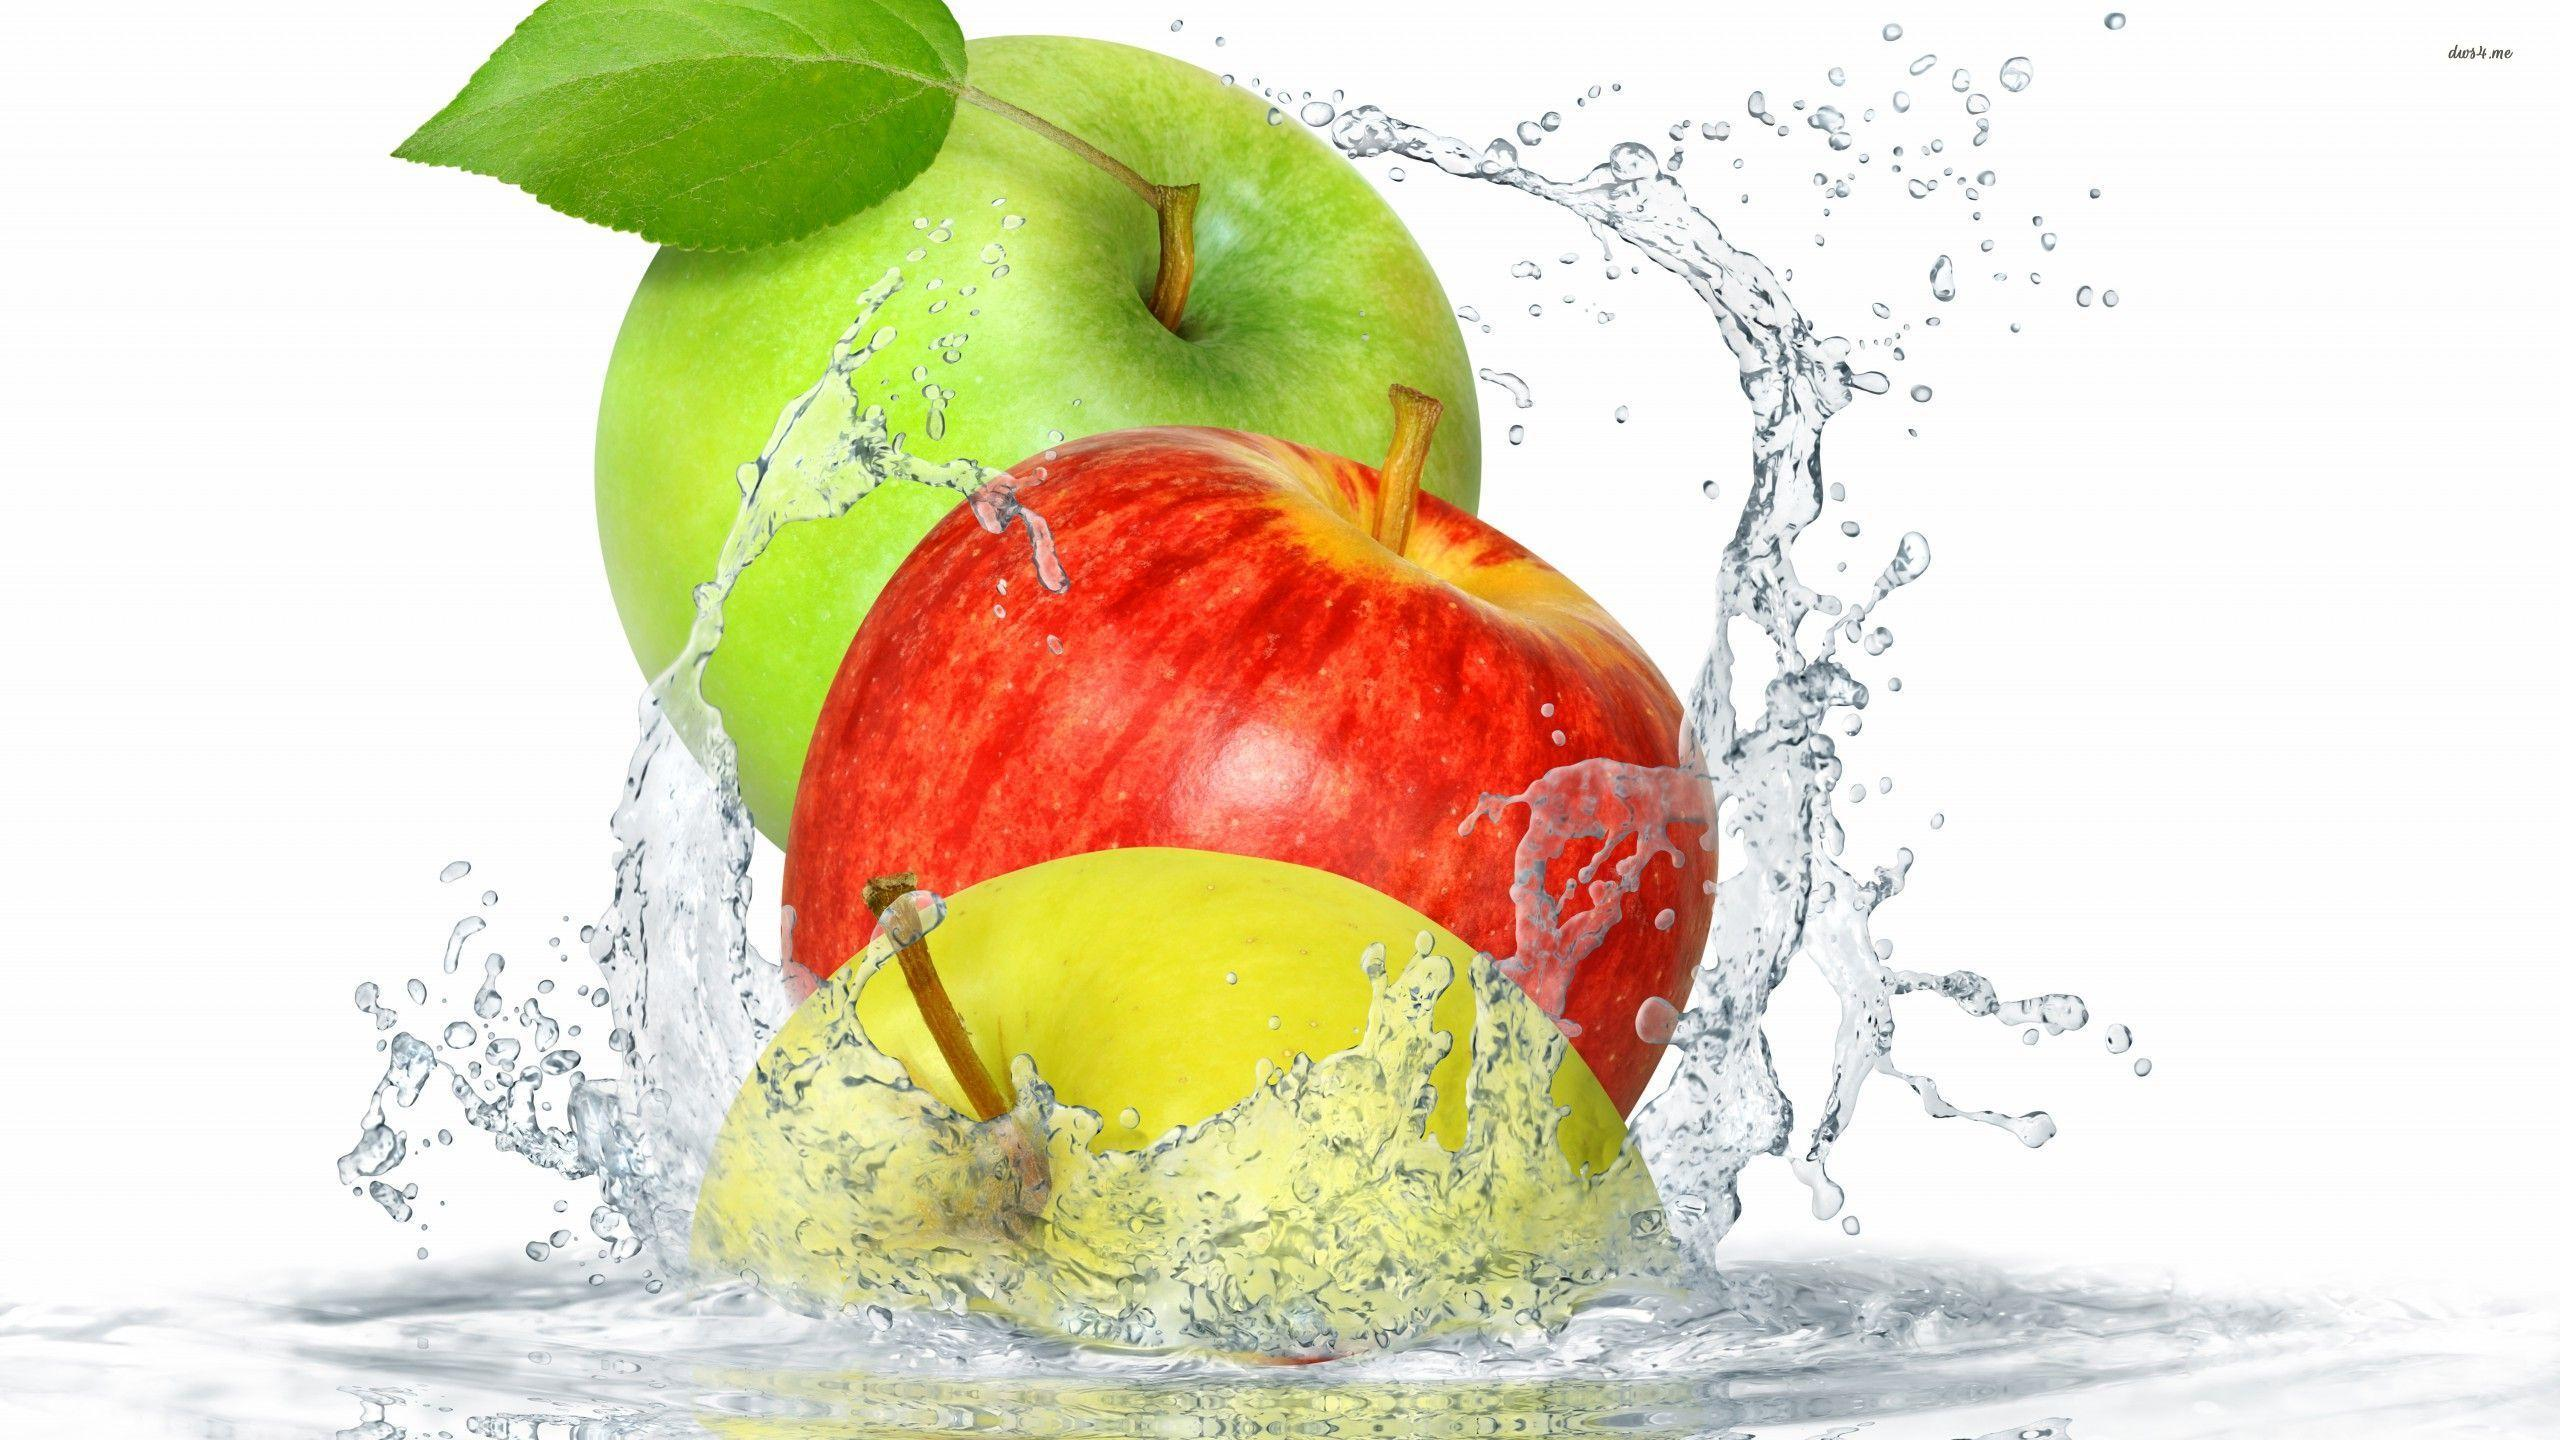 apples wallpapers - wallpaper cave